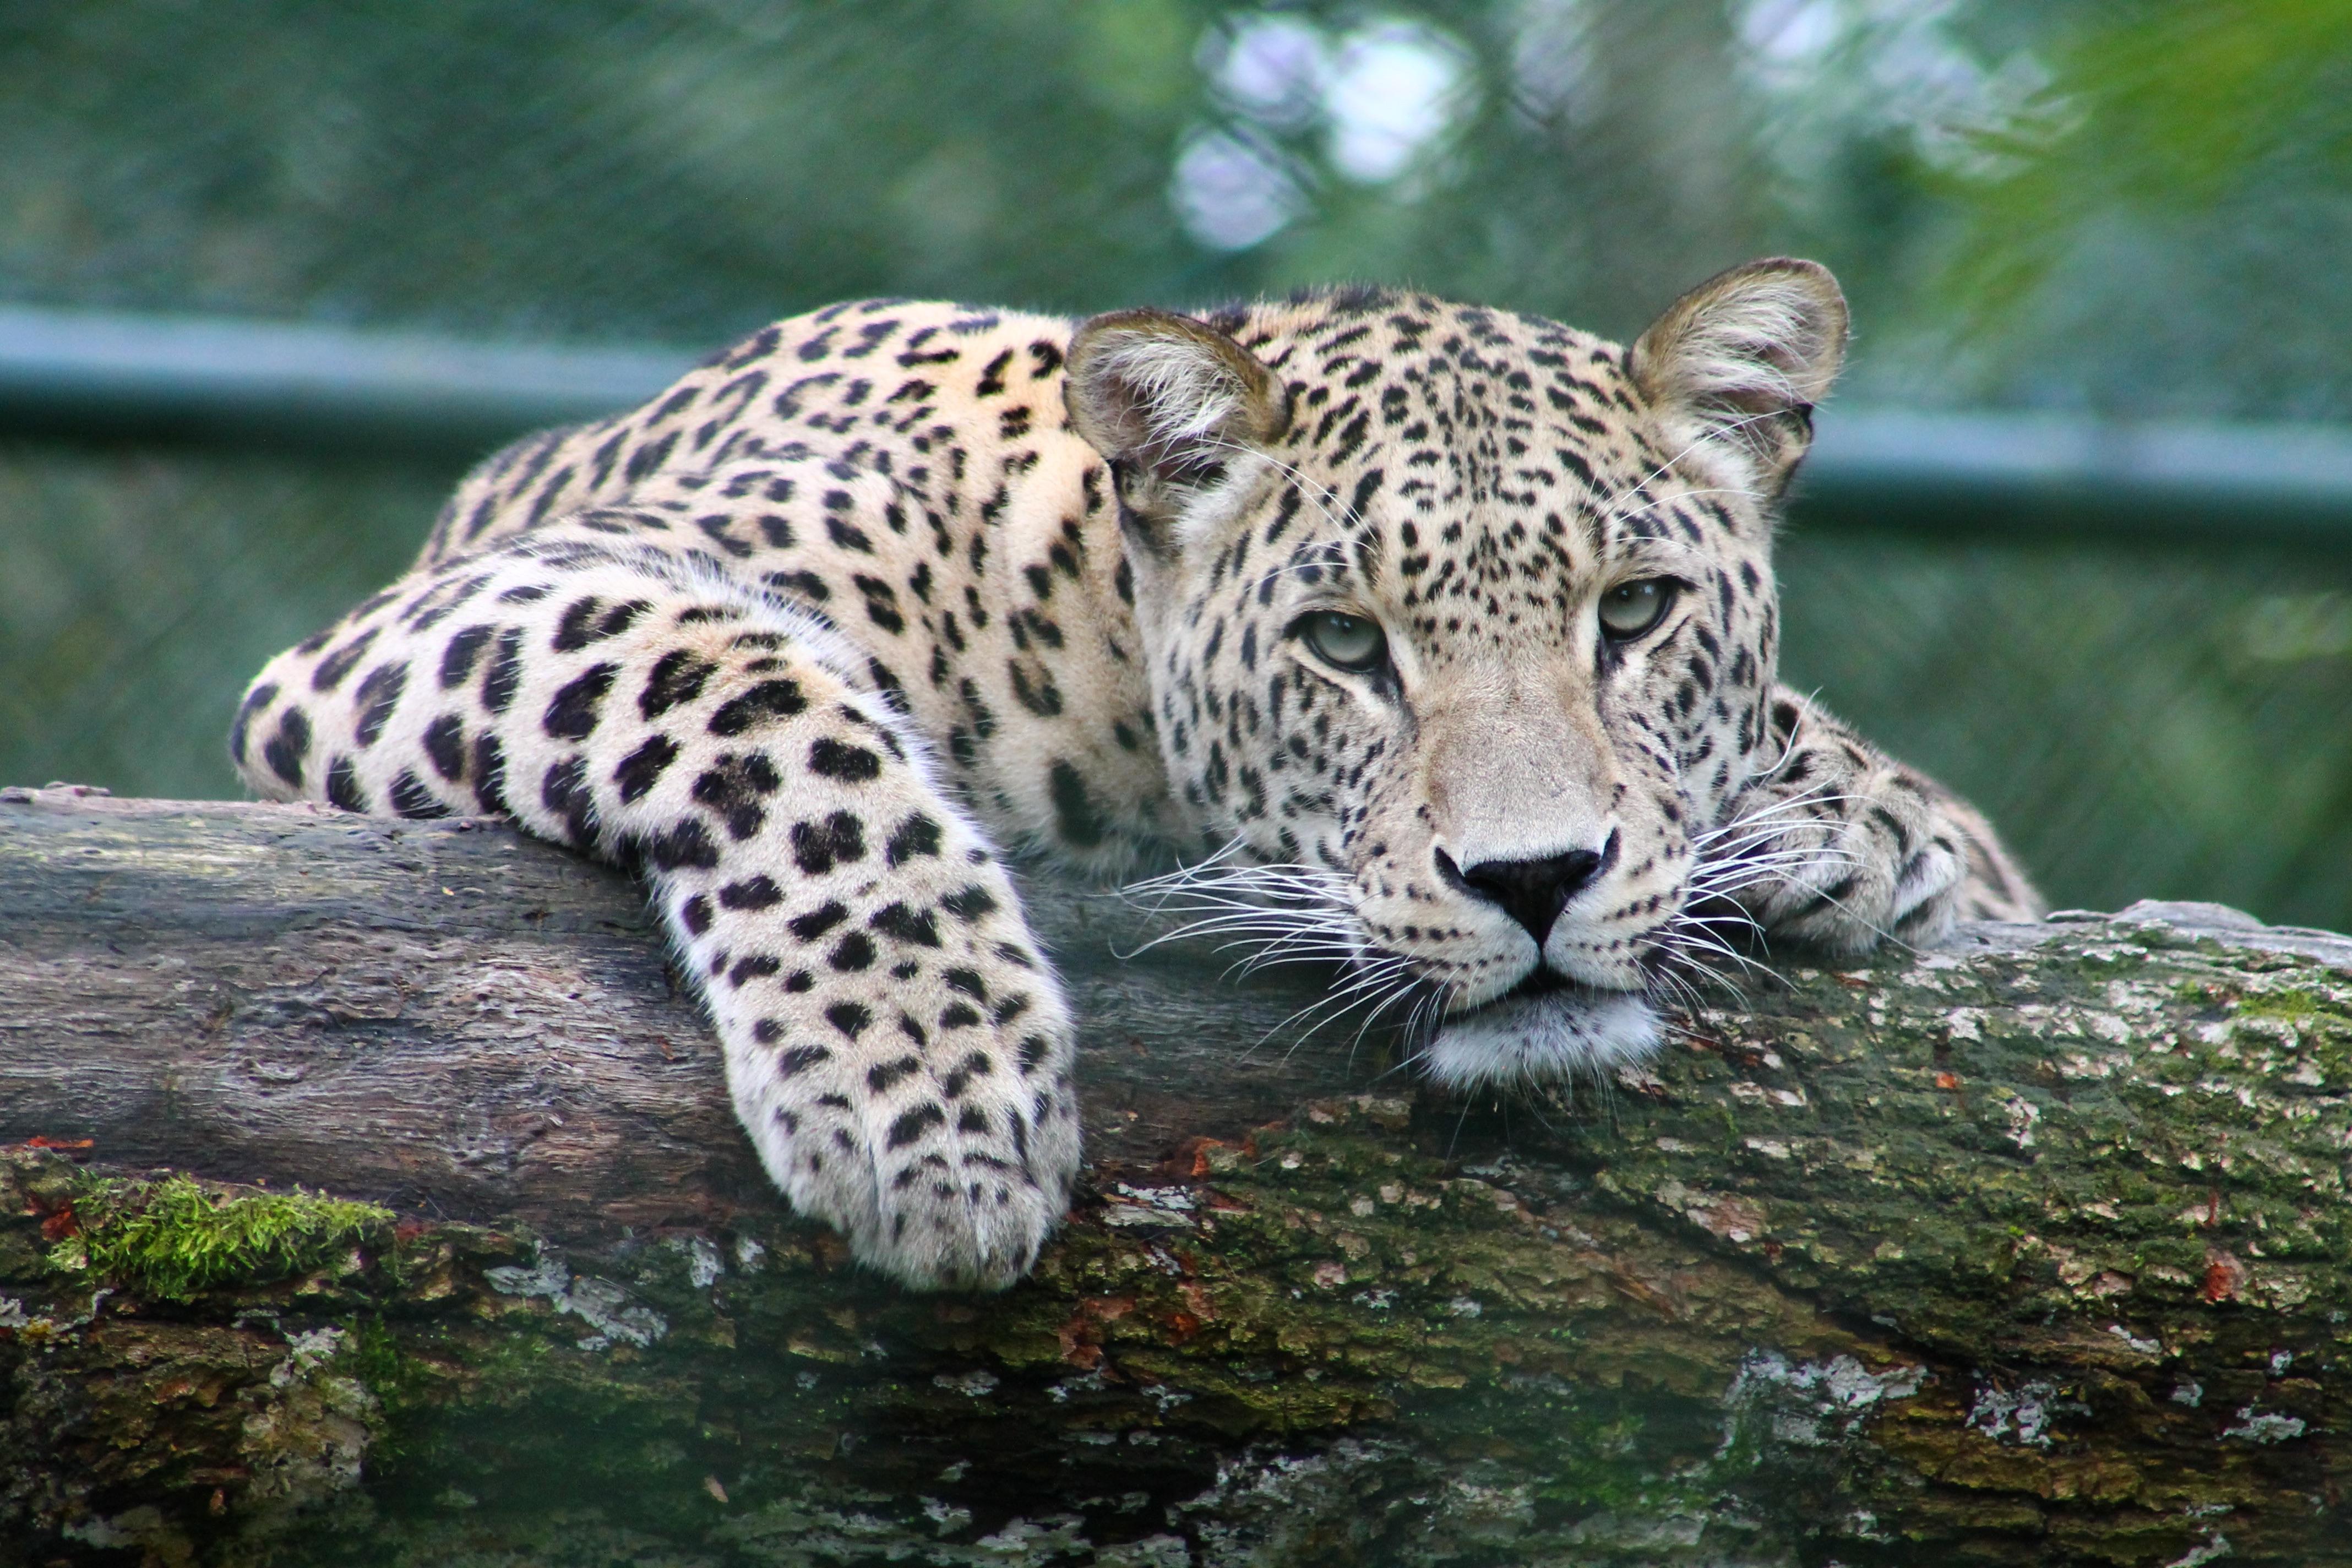 Animal Wildlife Wild Zoo Cat Mammal Fauna Leopard Vertebrate Jaguar Cats Like